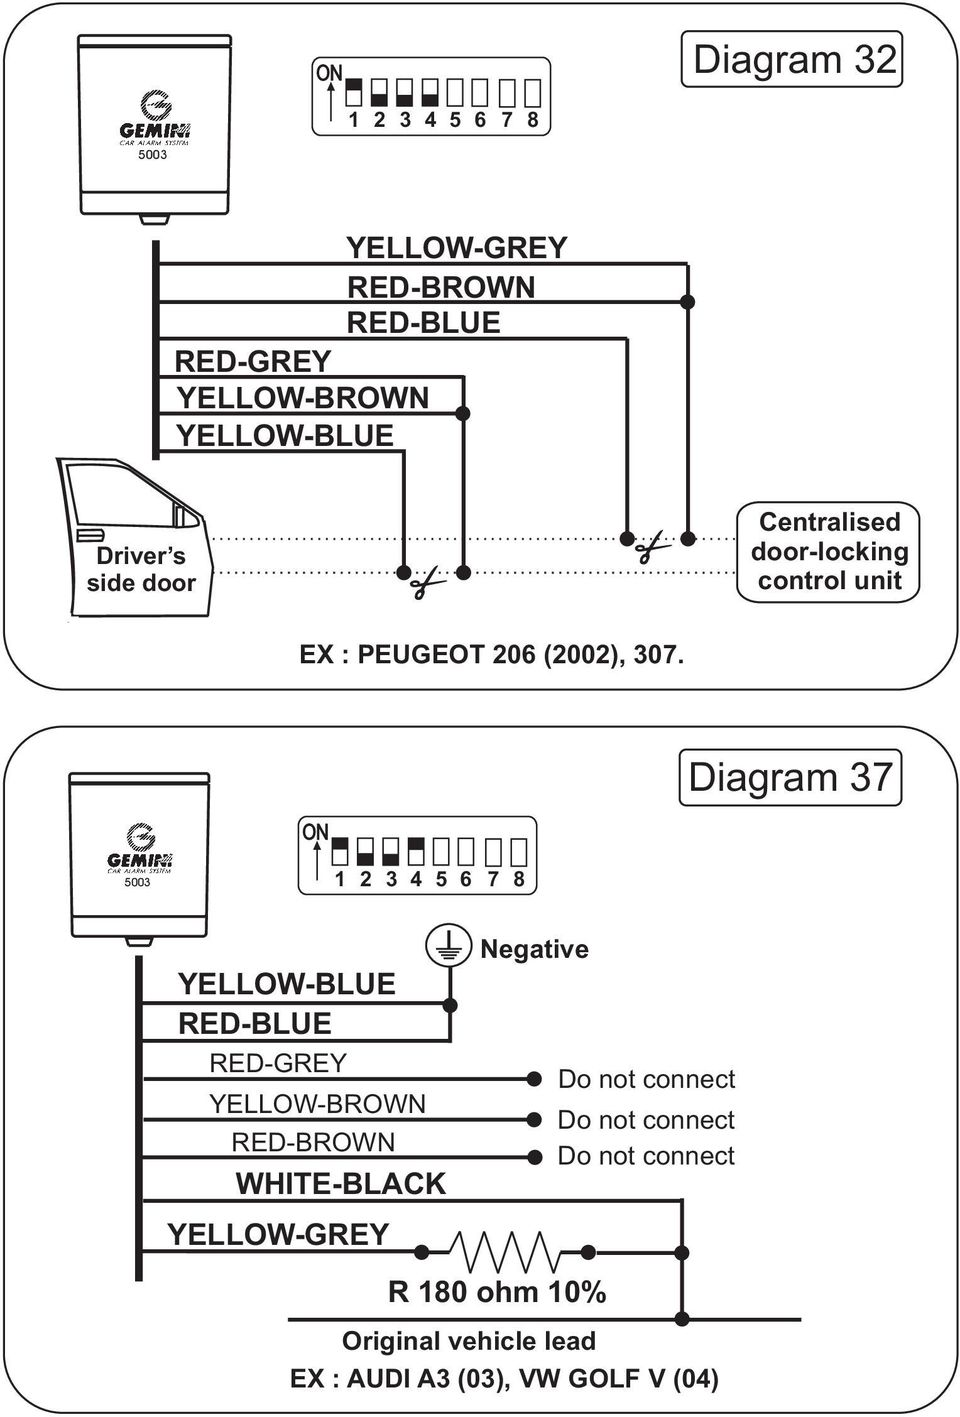 medium resolution of 5002 3 installation instructions pdf 2002 307 skoda fabia central locking wiring diagram